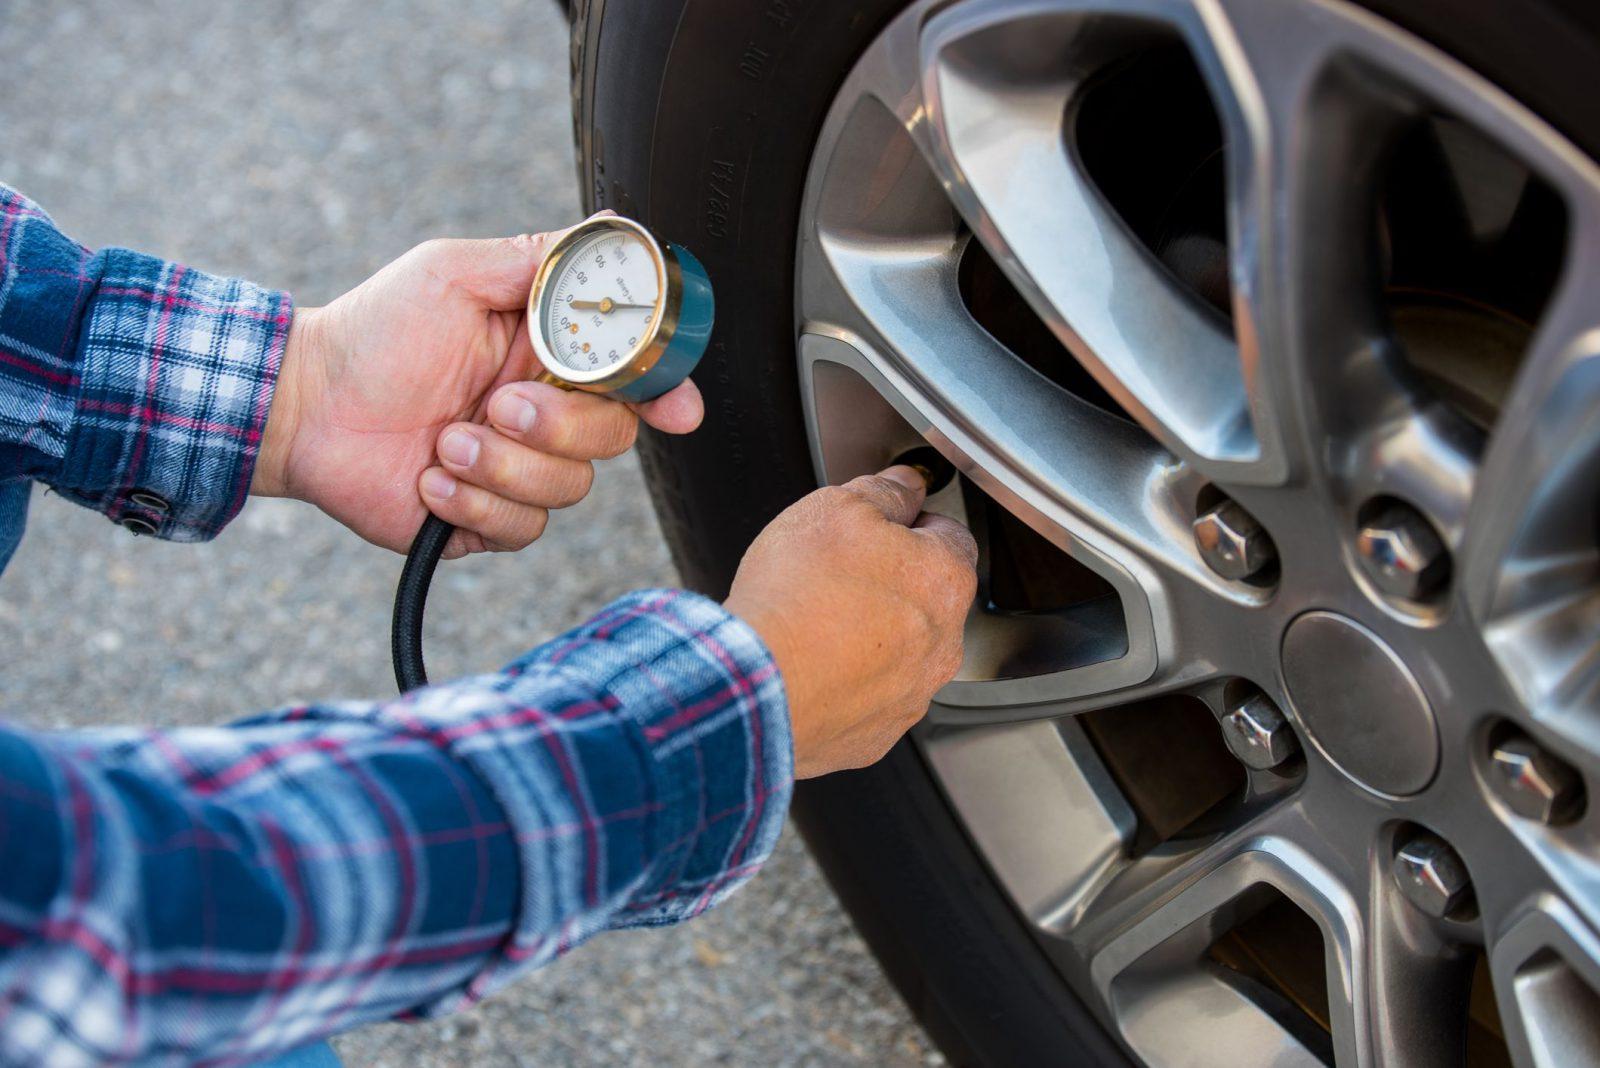 Dial tire pressure gauges